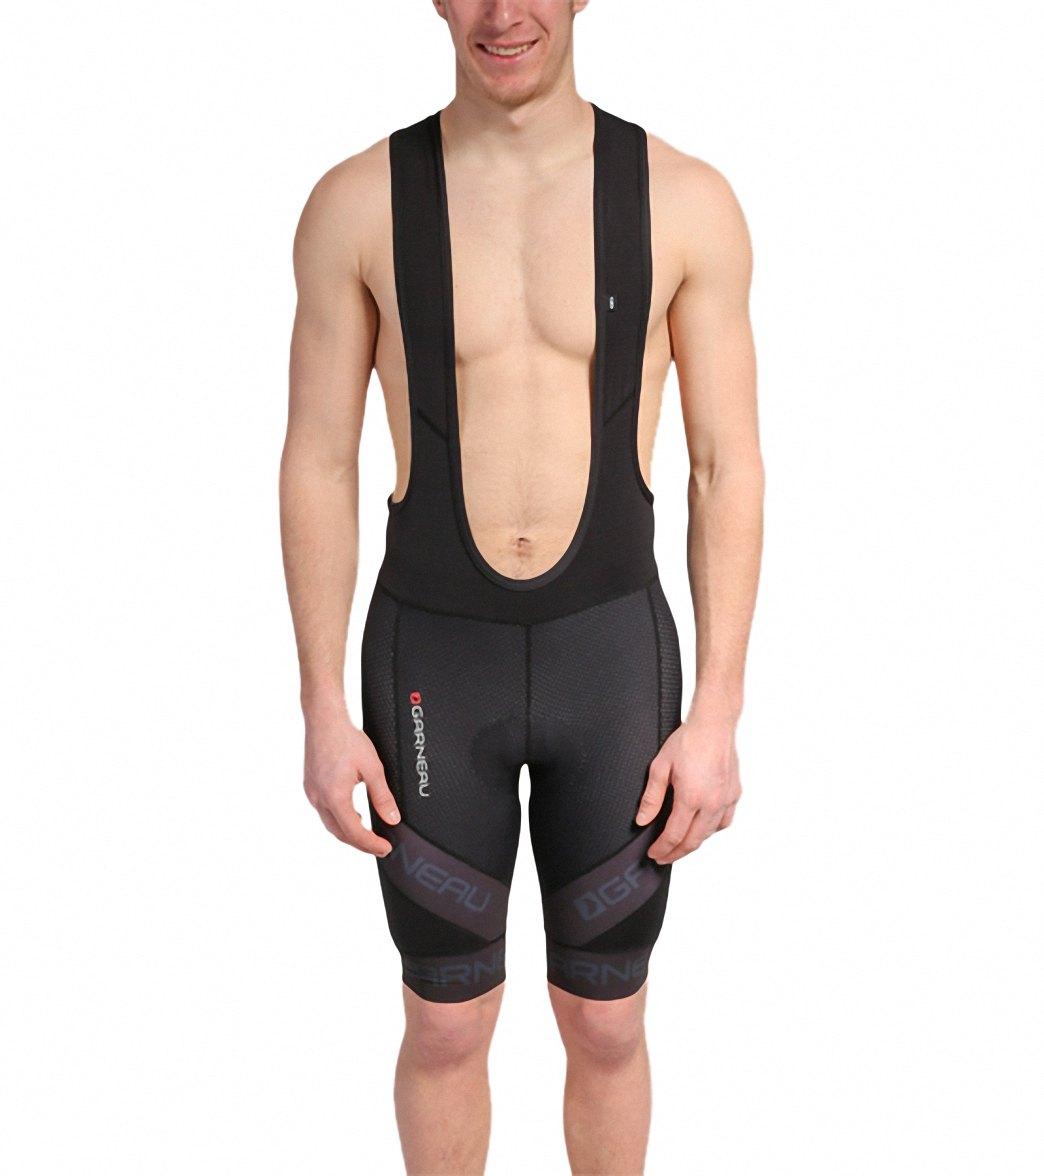 bec17afac Louis Garneau Men s Mondo Evo Cycling Bib Shorts at SwimOutlet ...